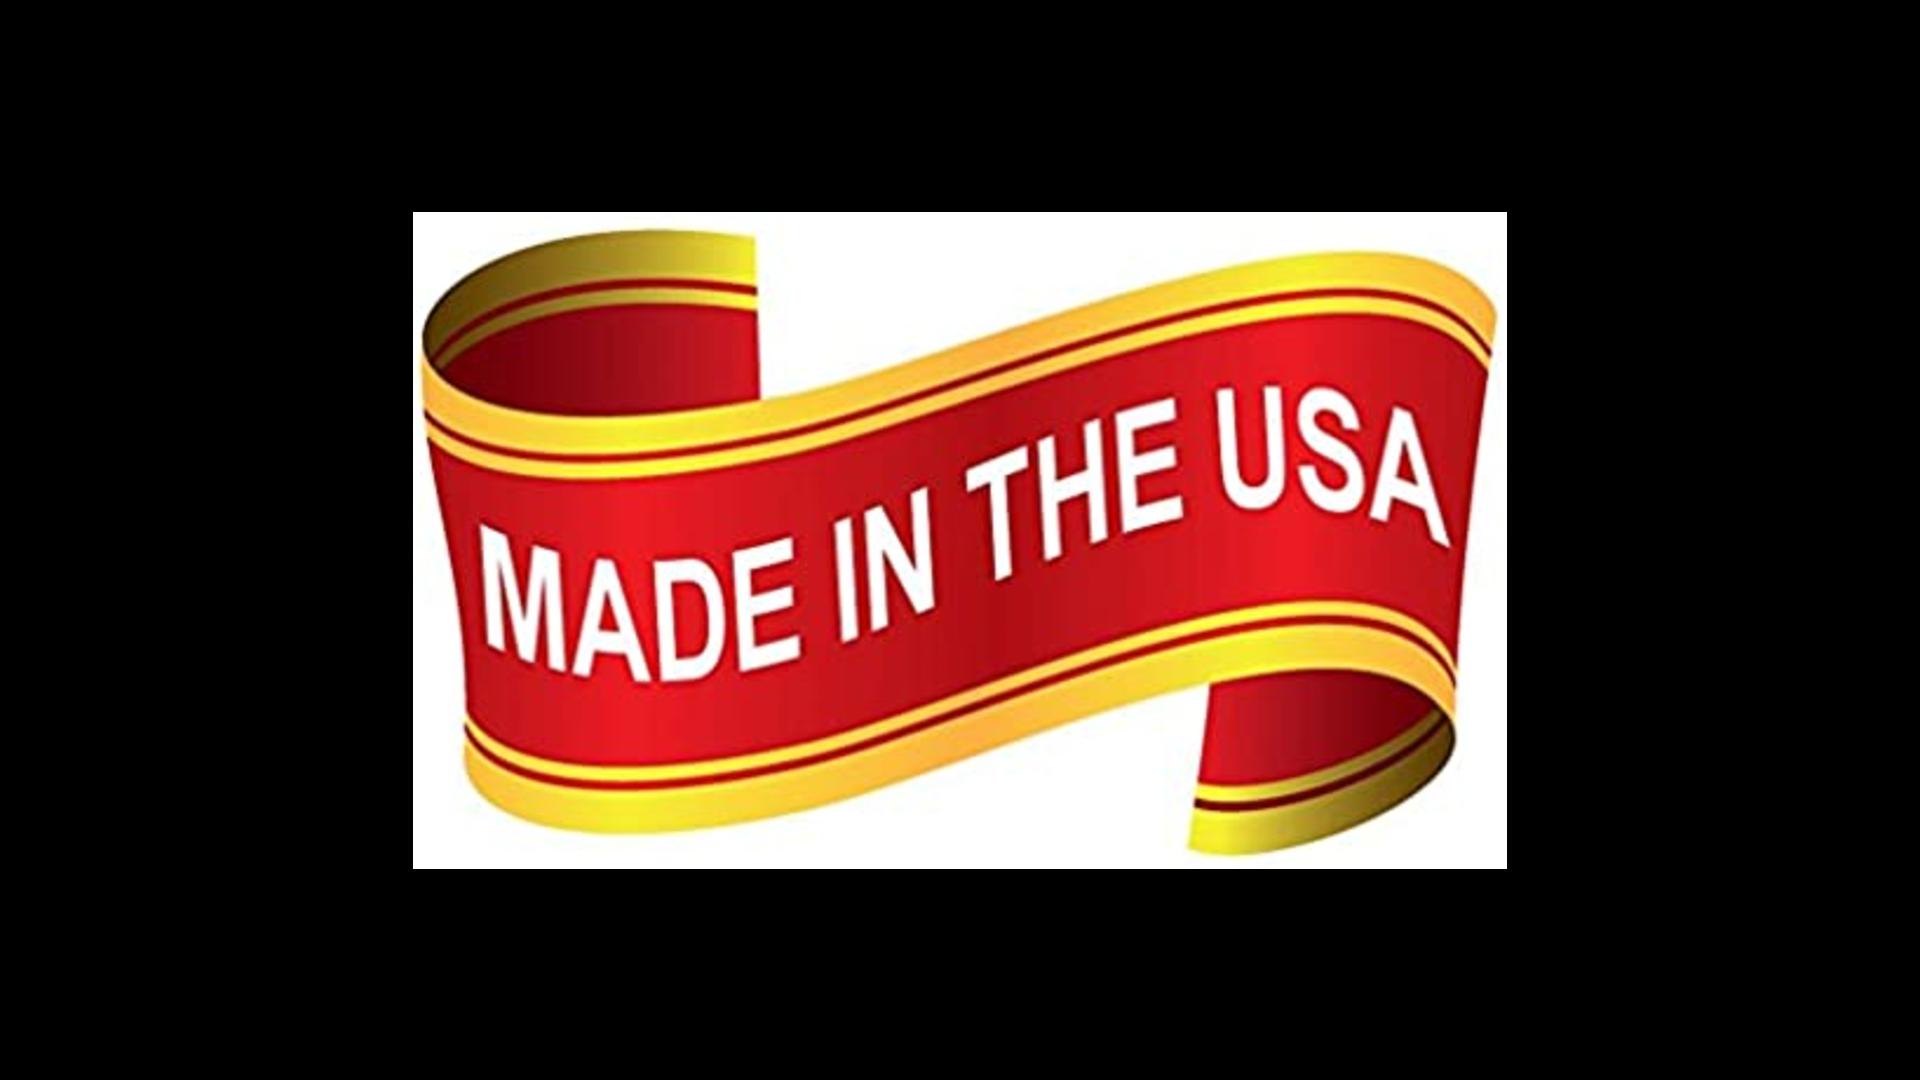 Bess made in U.S.A banner